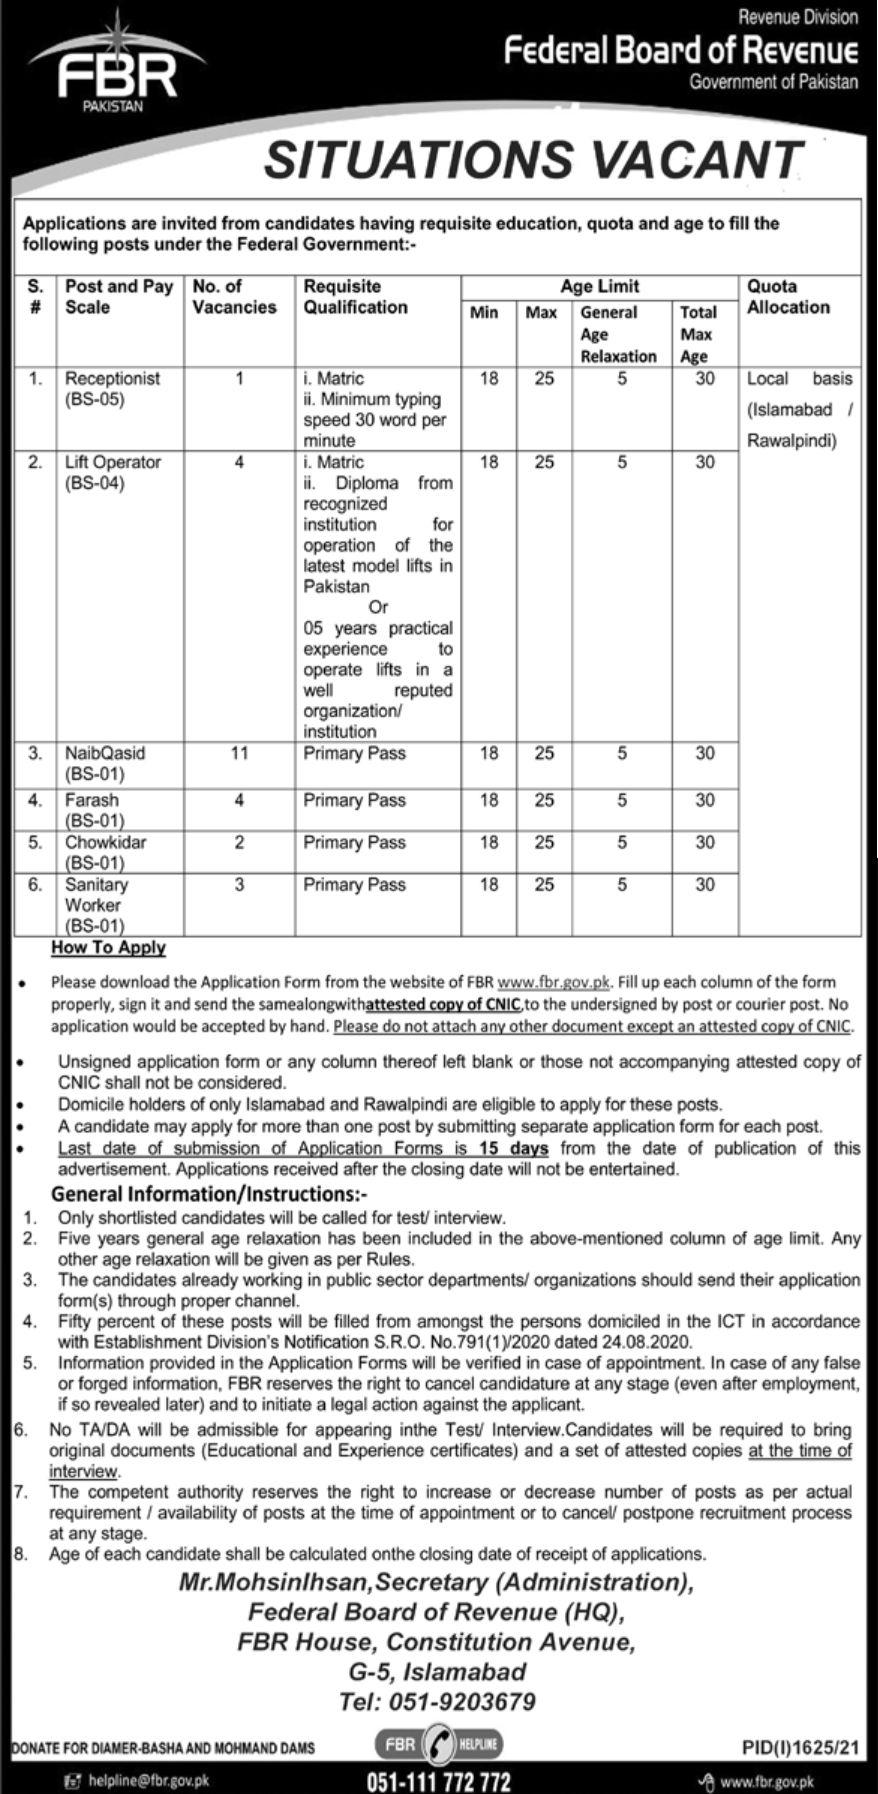 Federal Board of Revenue FBR Vacancies 2021 – Dailyjobs.pk 3